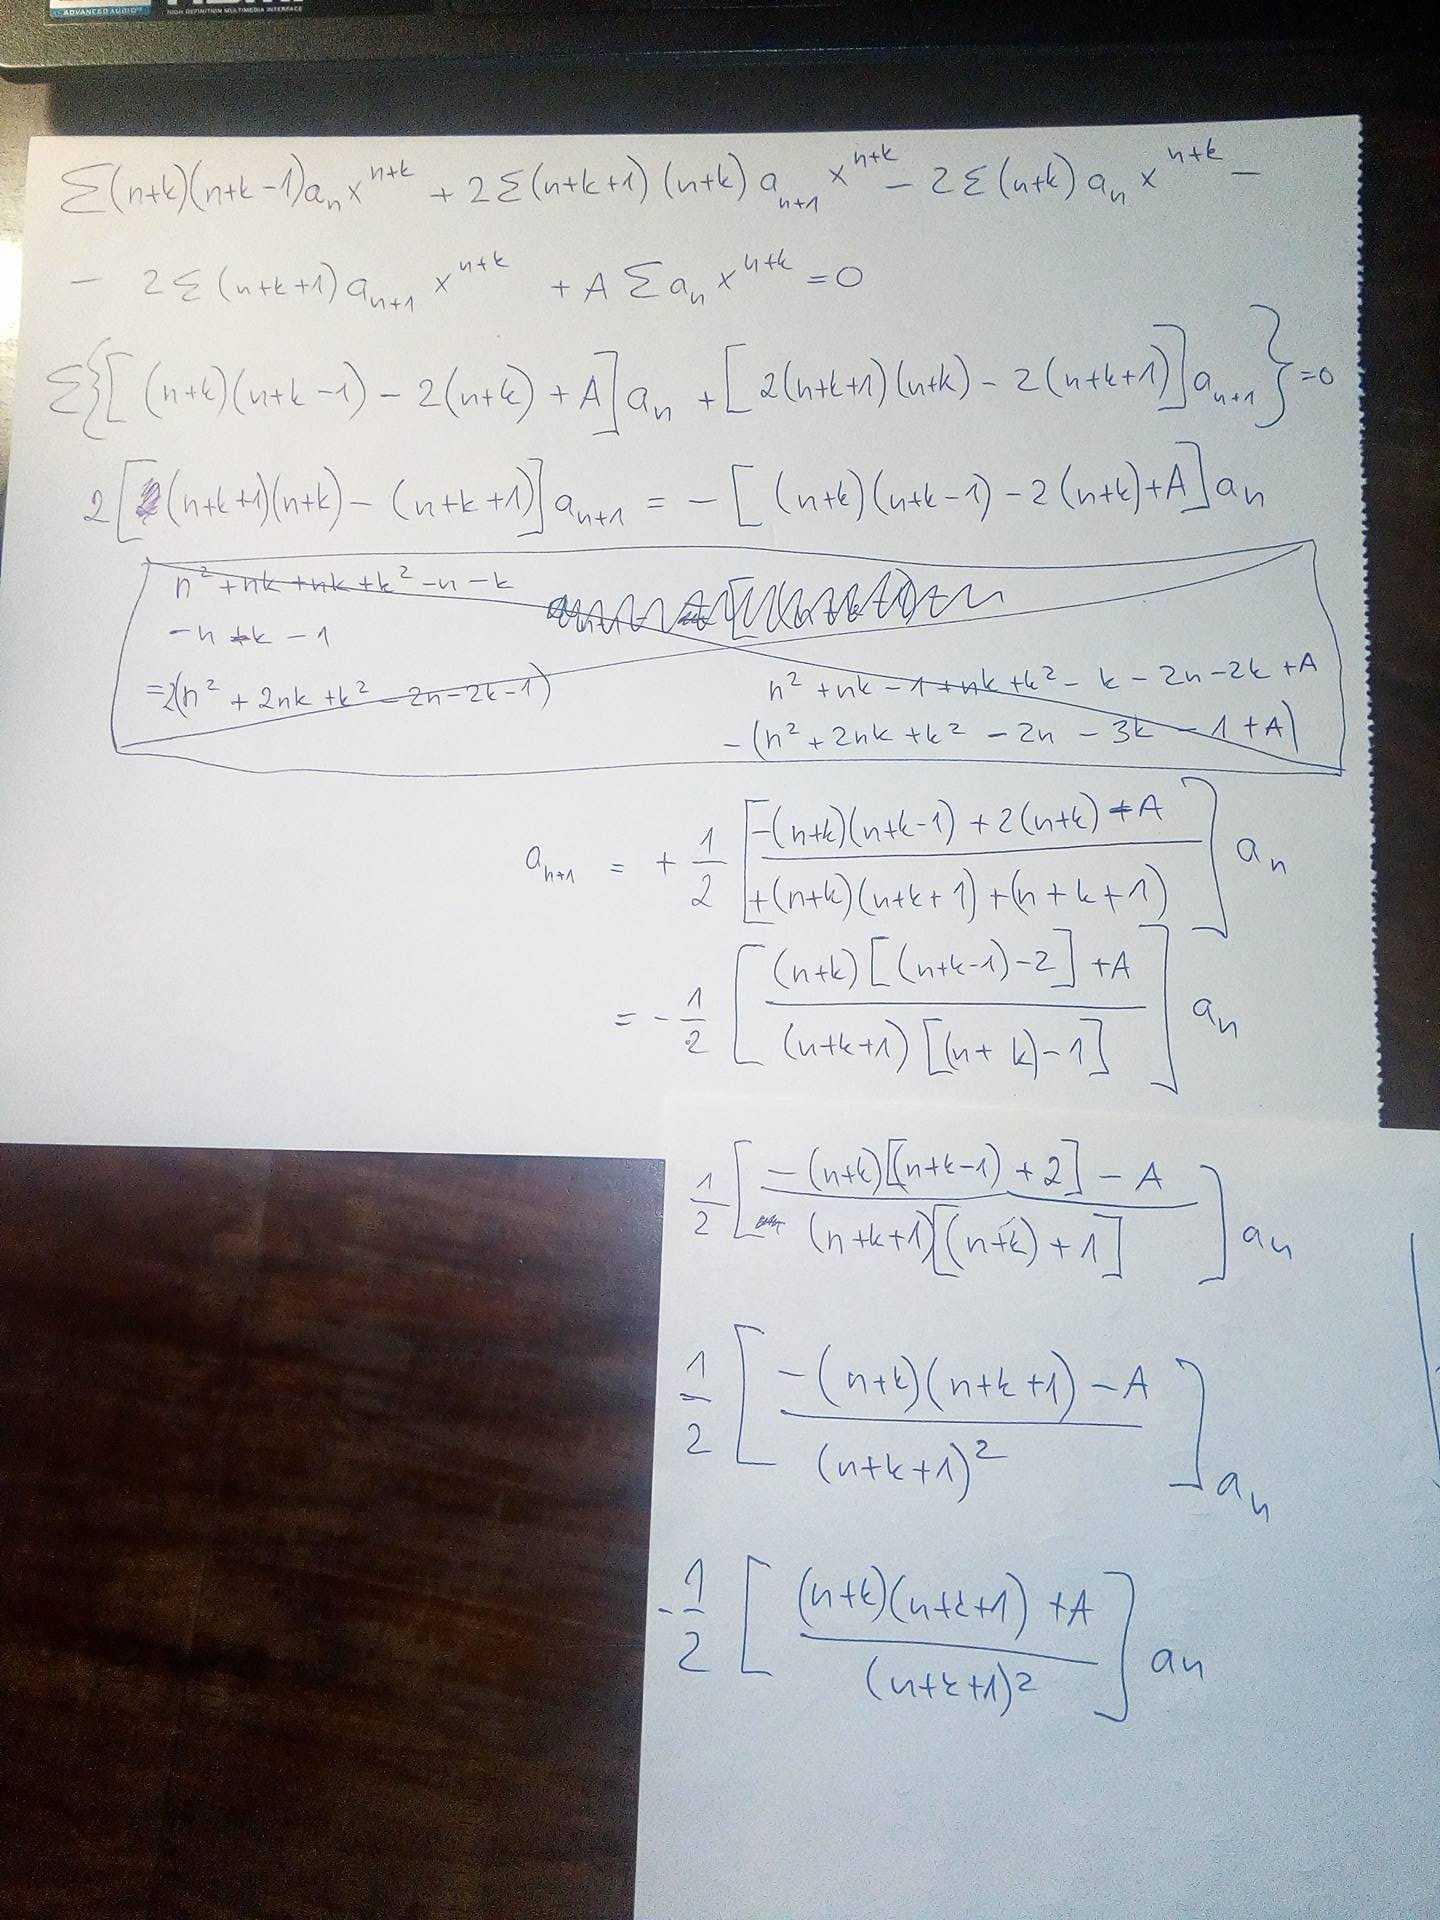 http://forum.matematika.cz/upload3/img/2017-08/88045_21123289_10203427216757628_33274224_o.jpg